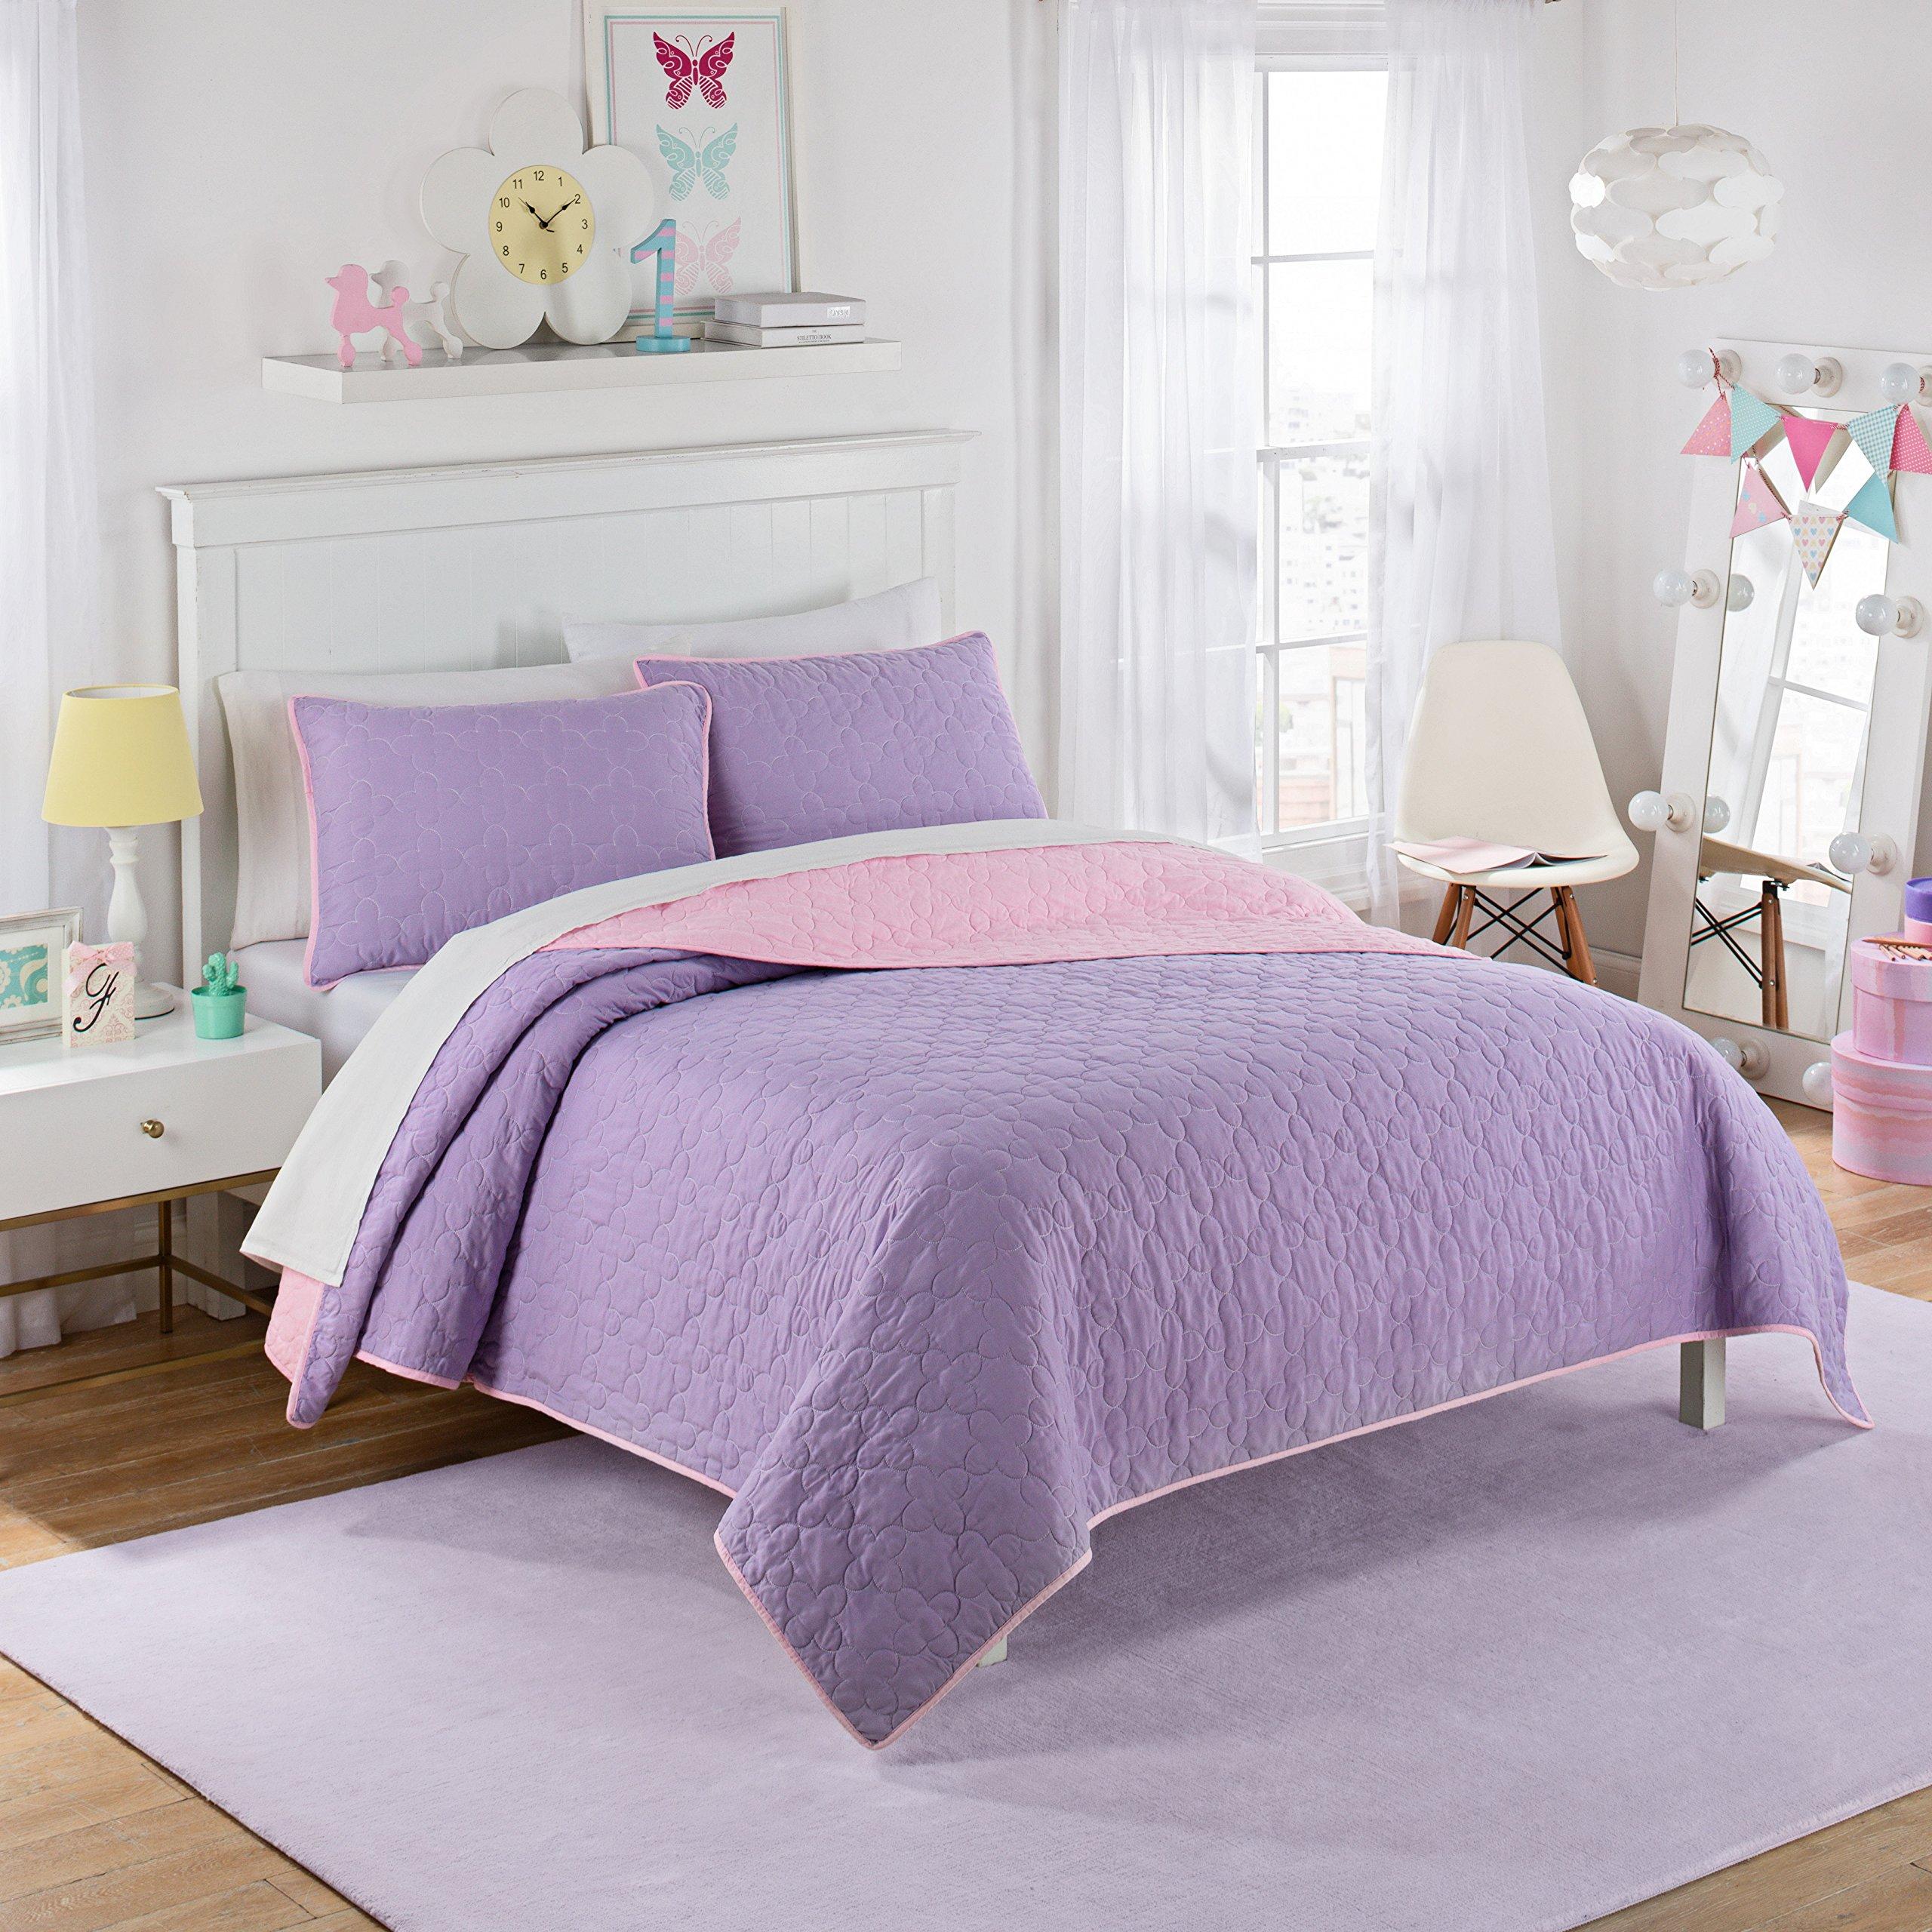 Waverly Kids Framework Quilt Set, Twin, Purple by WAVERLY